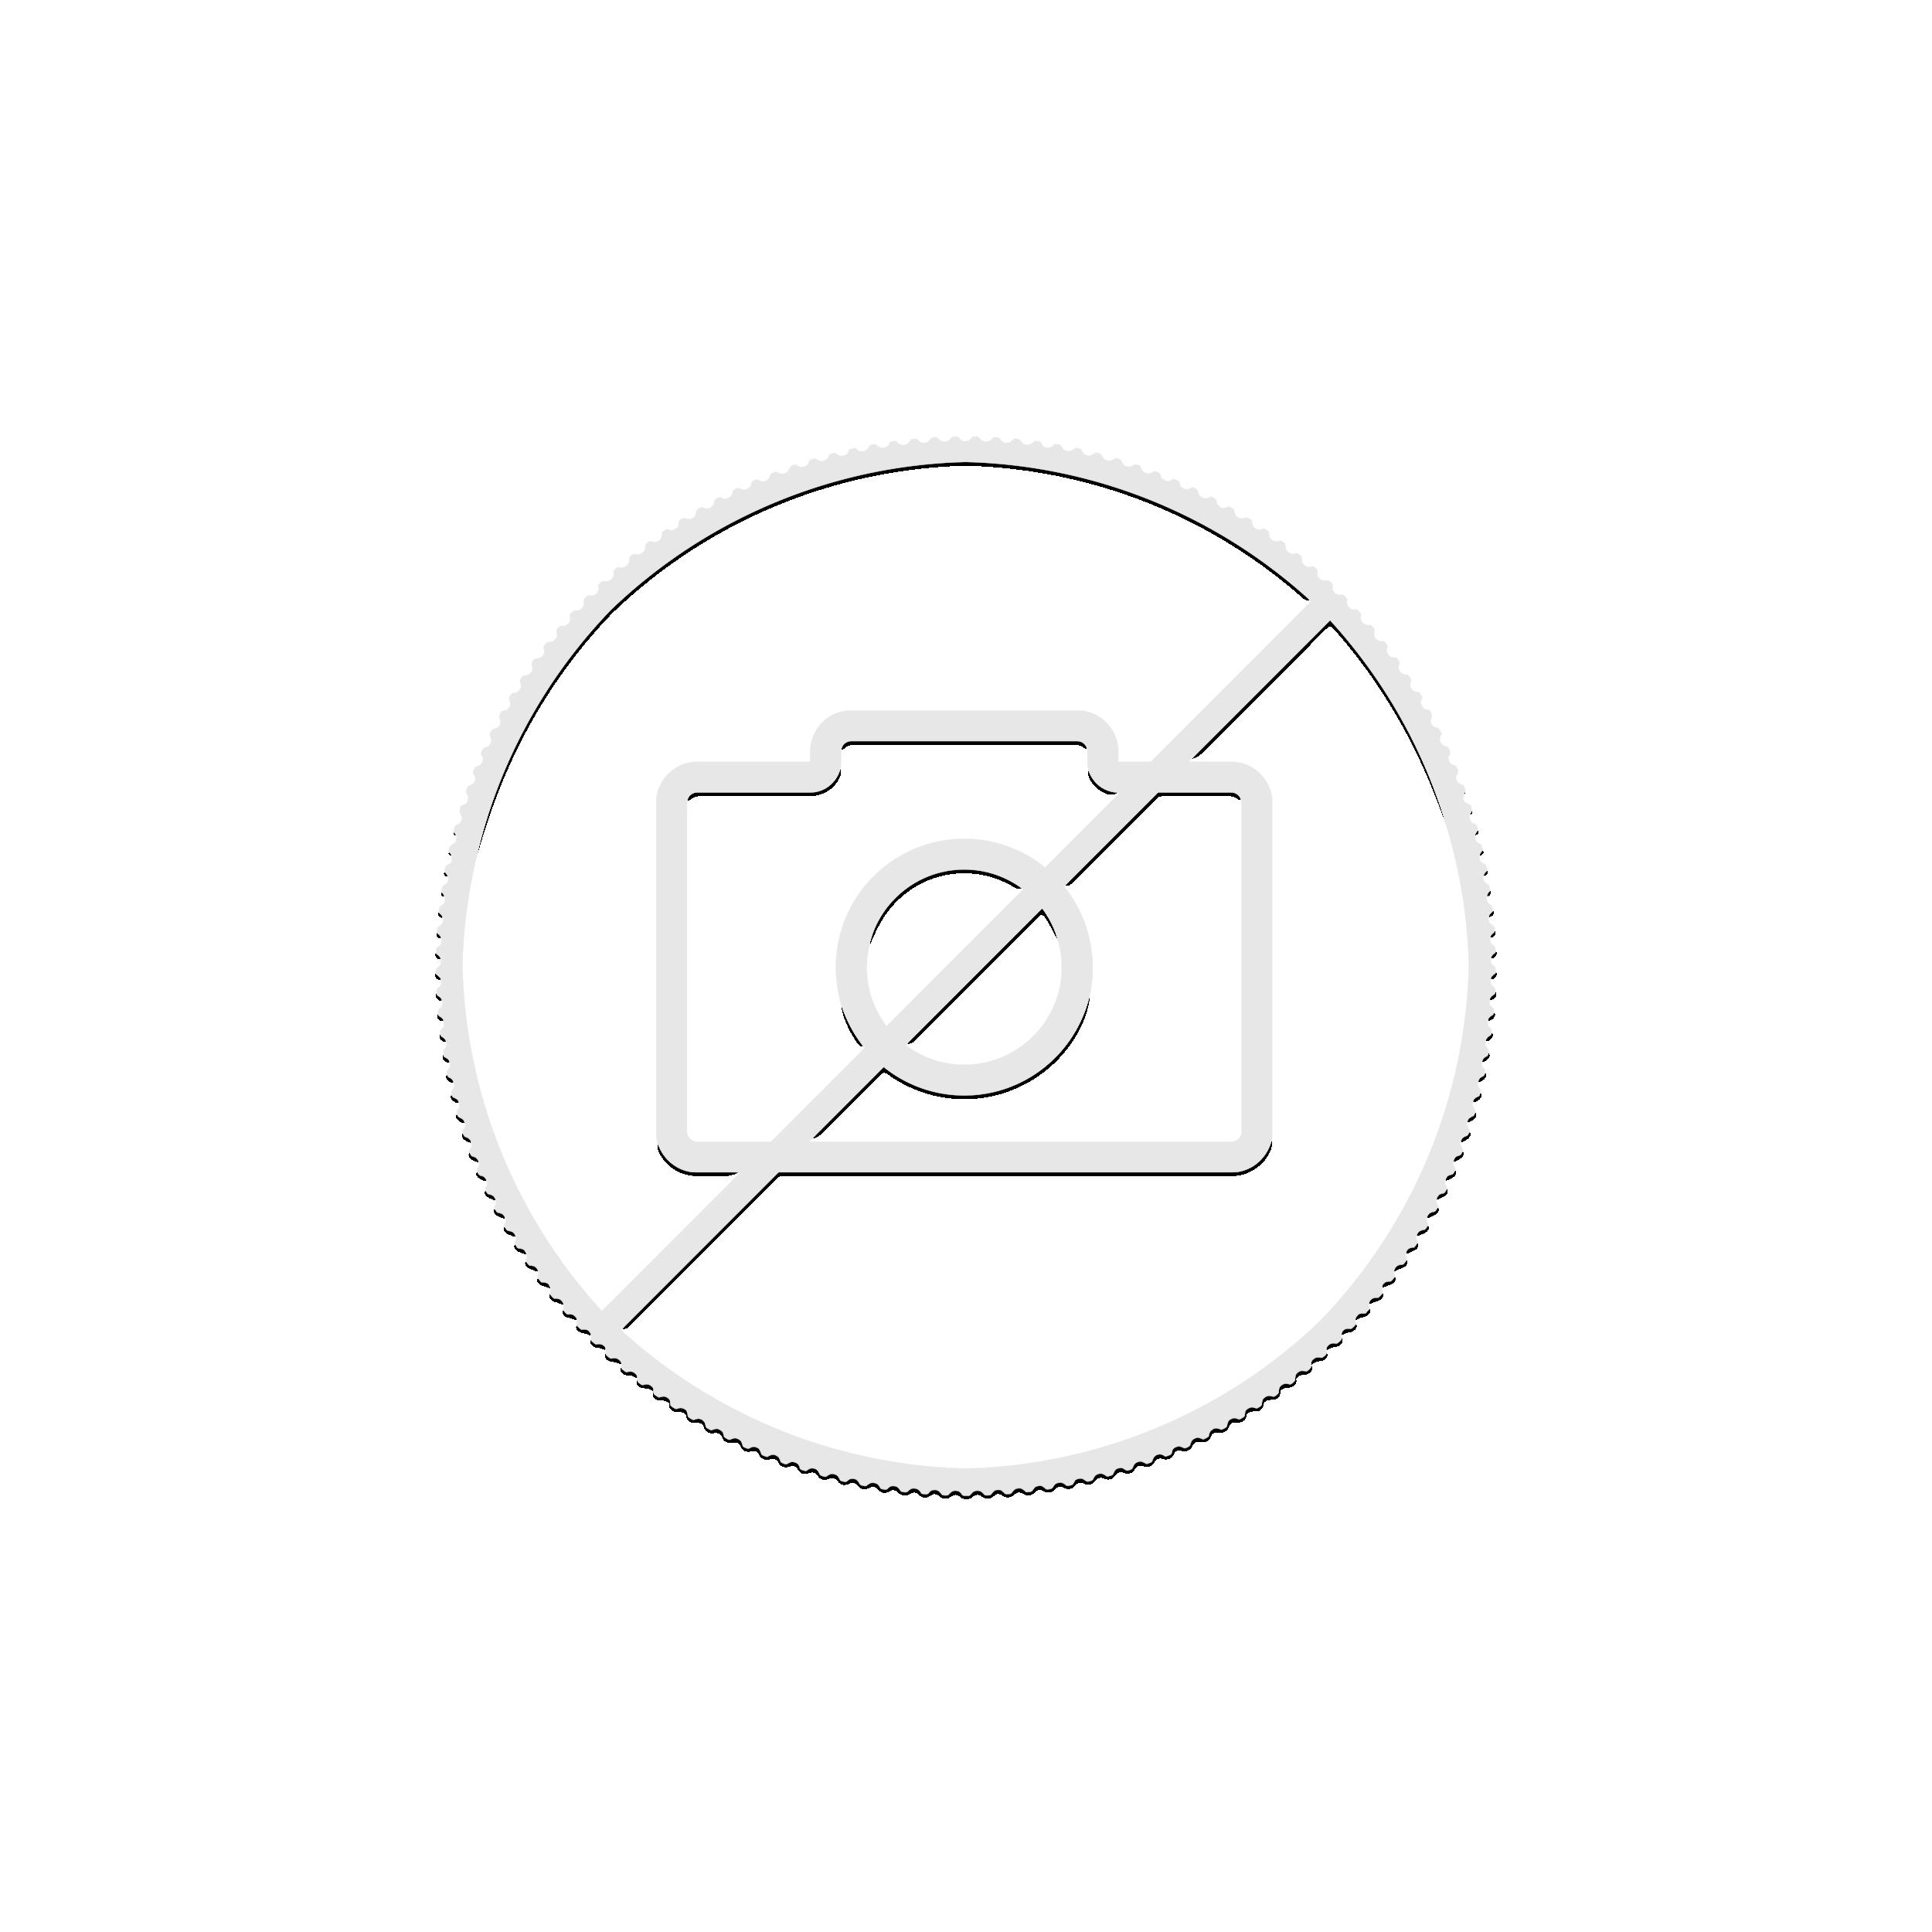 Gold bar 250 grams